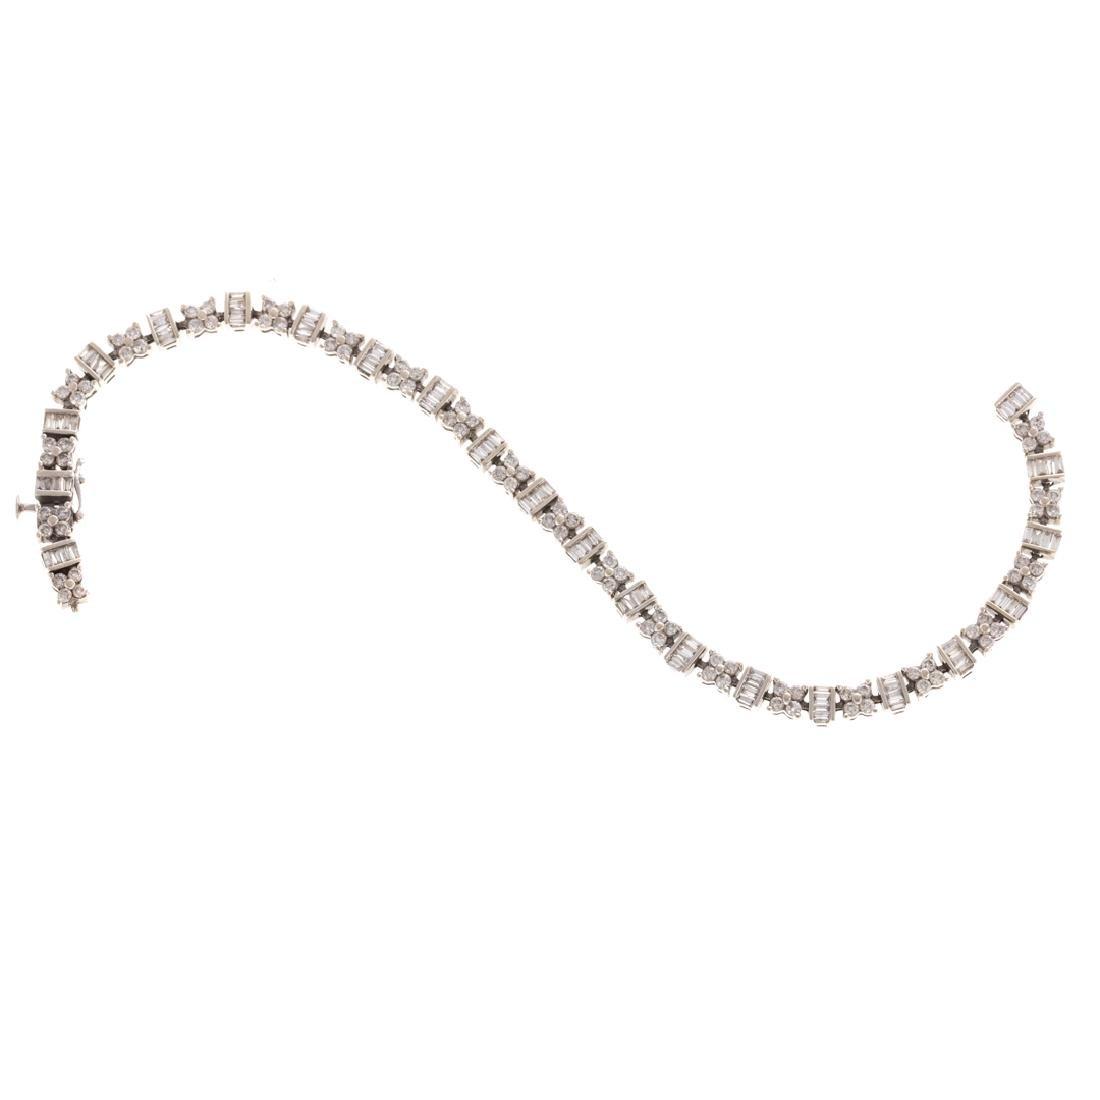 A Lady's Classic 14K Diamond Line Bracelet